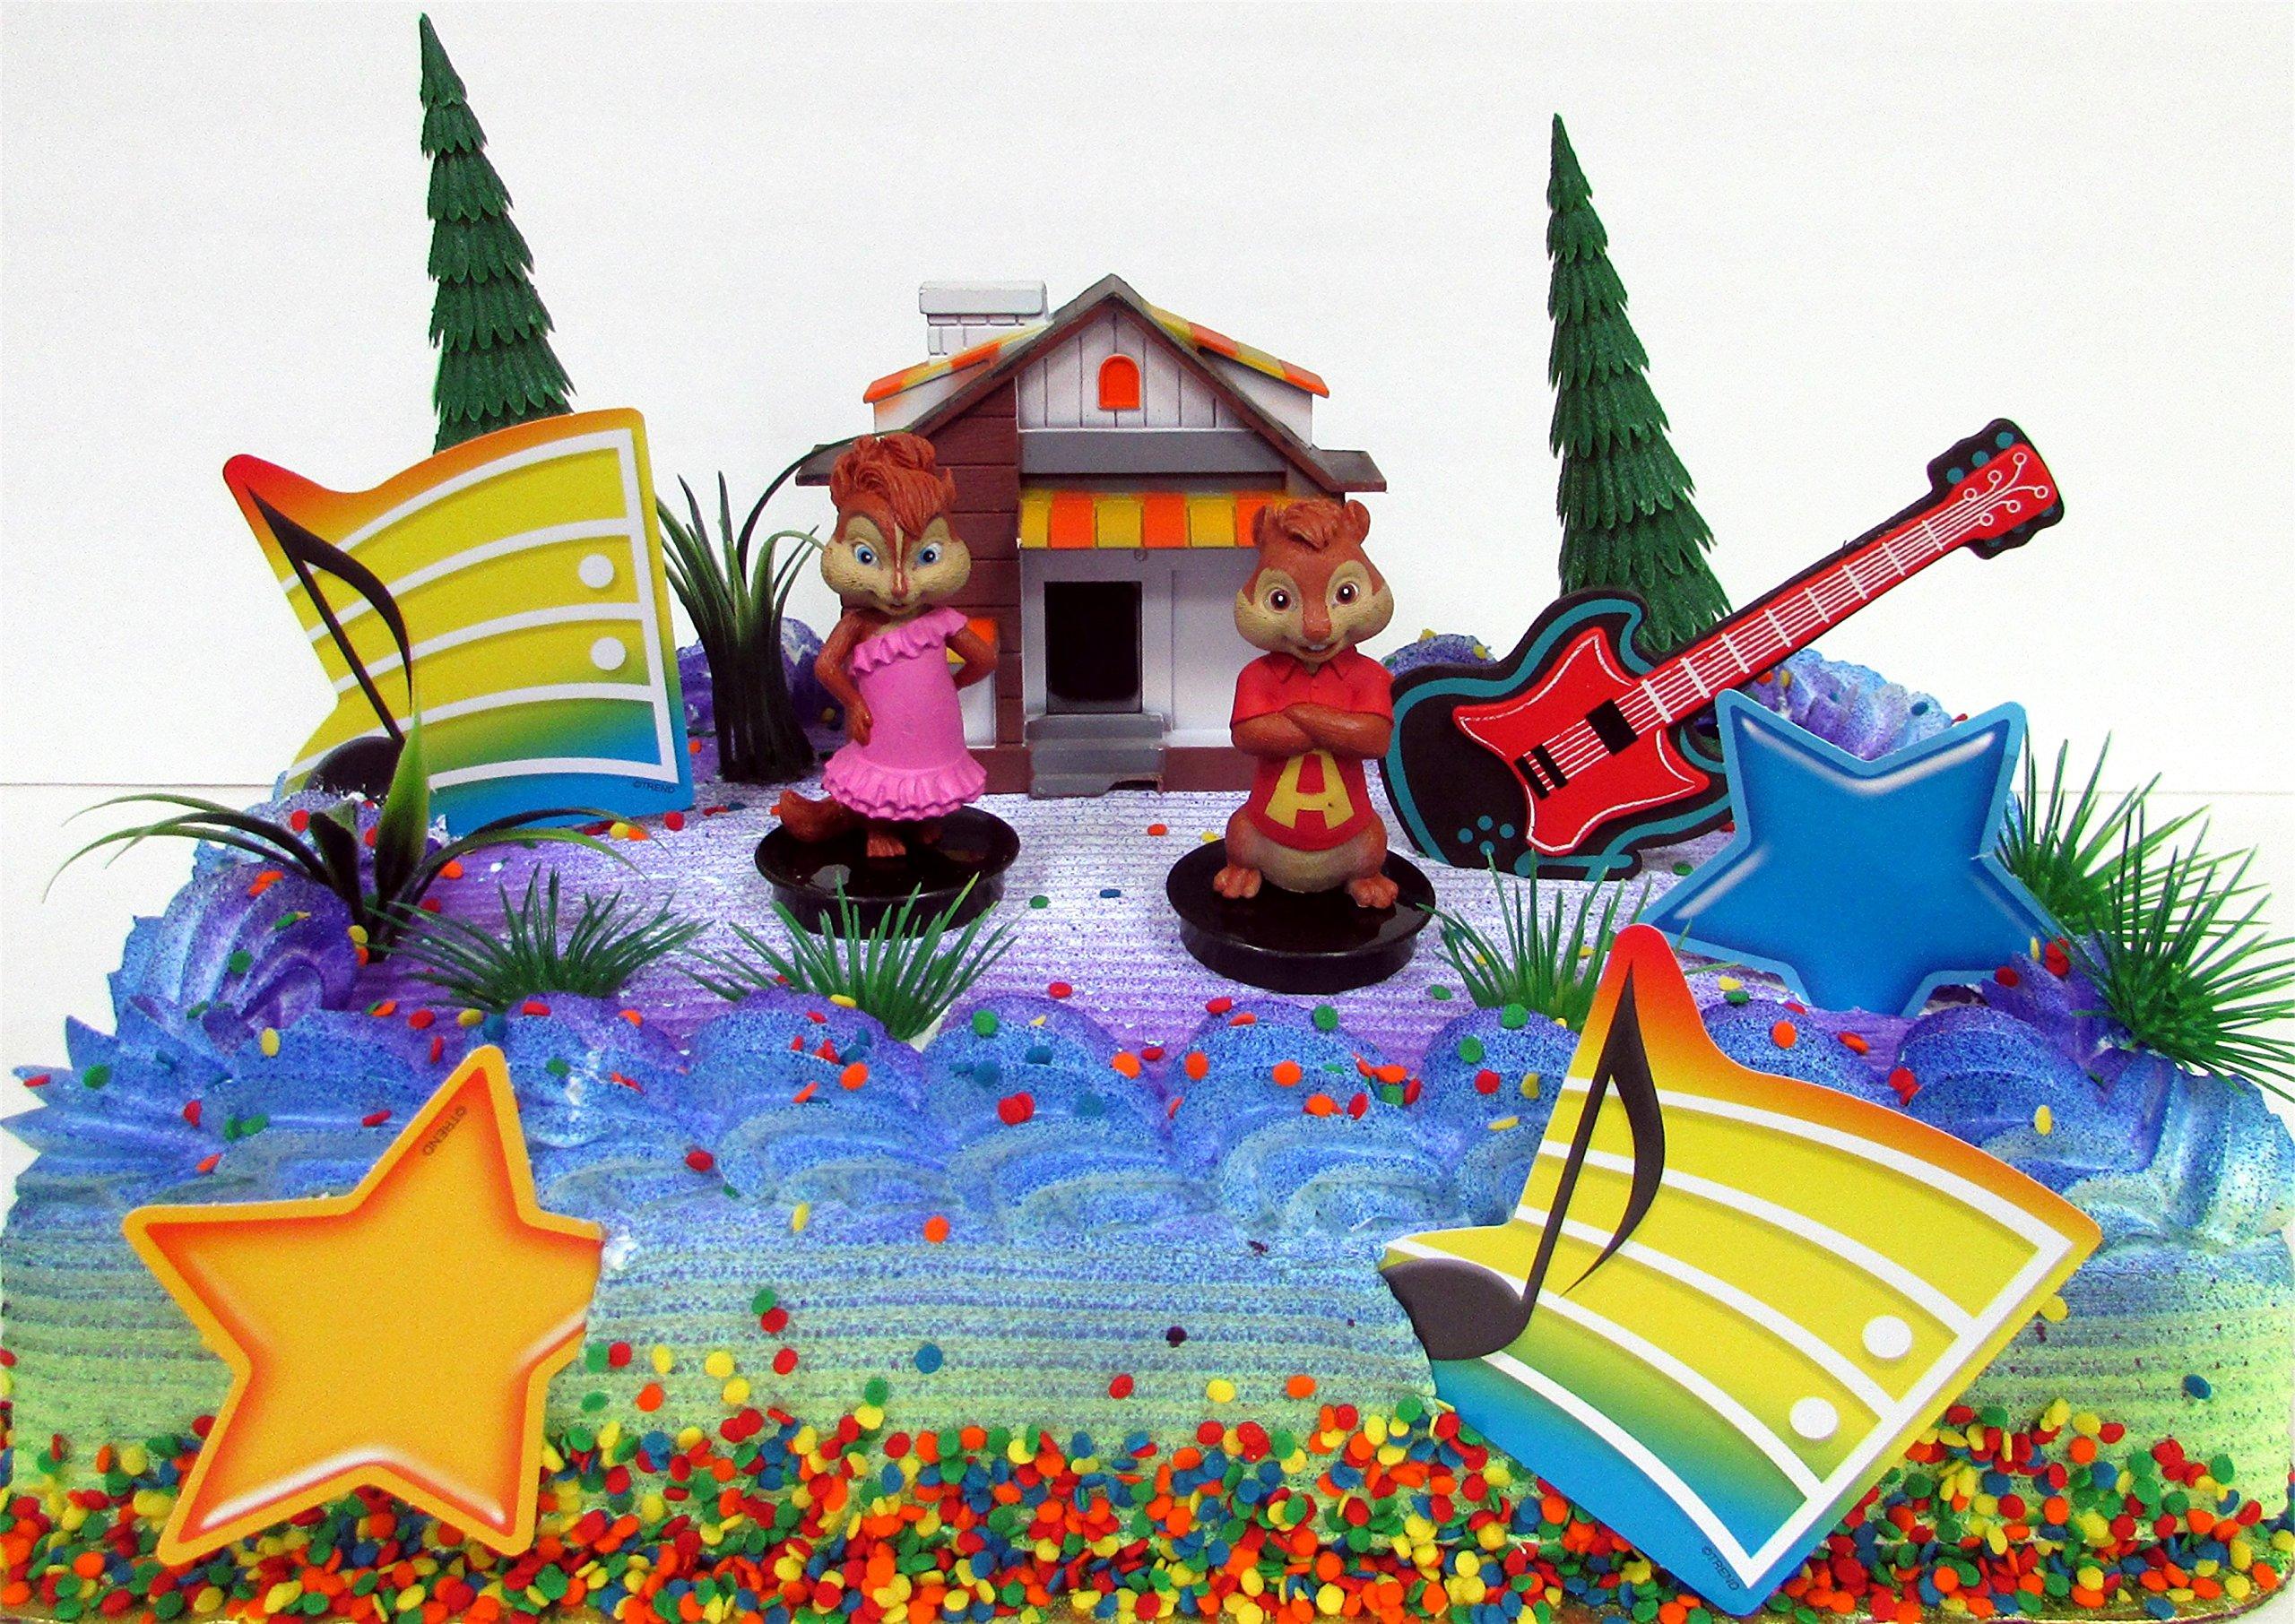 Astonishing Alvin And The Chipmunks 12 Piece Birthday Cake Topper Set Funny Birthday Cards Online Alyptdamsfinfo